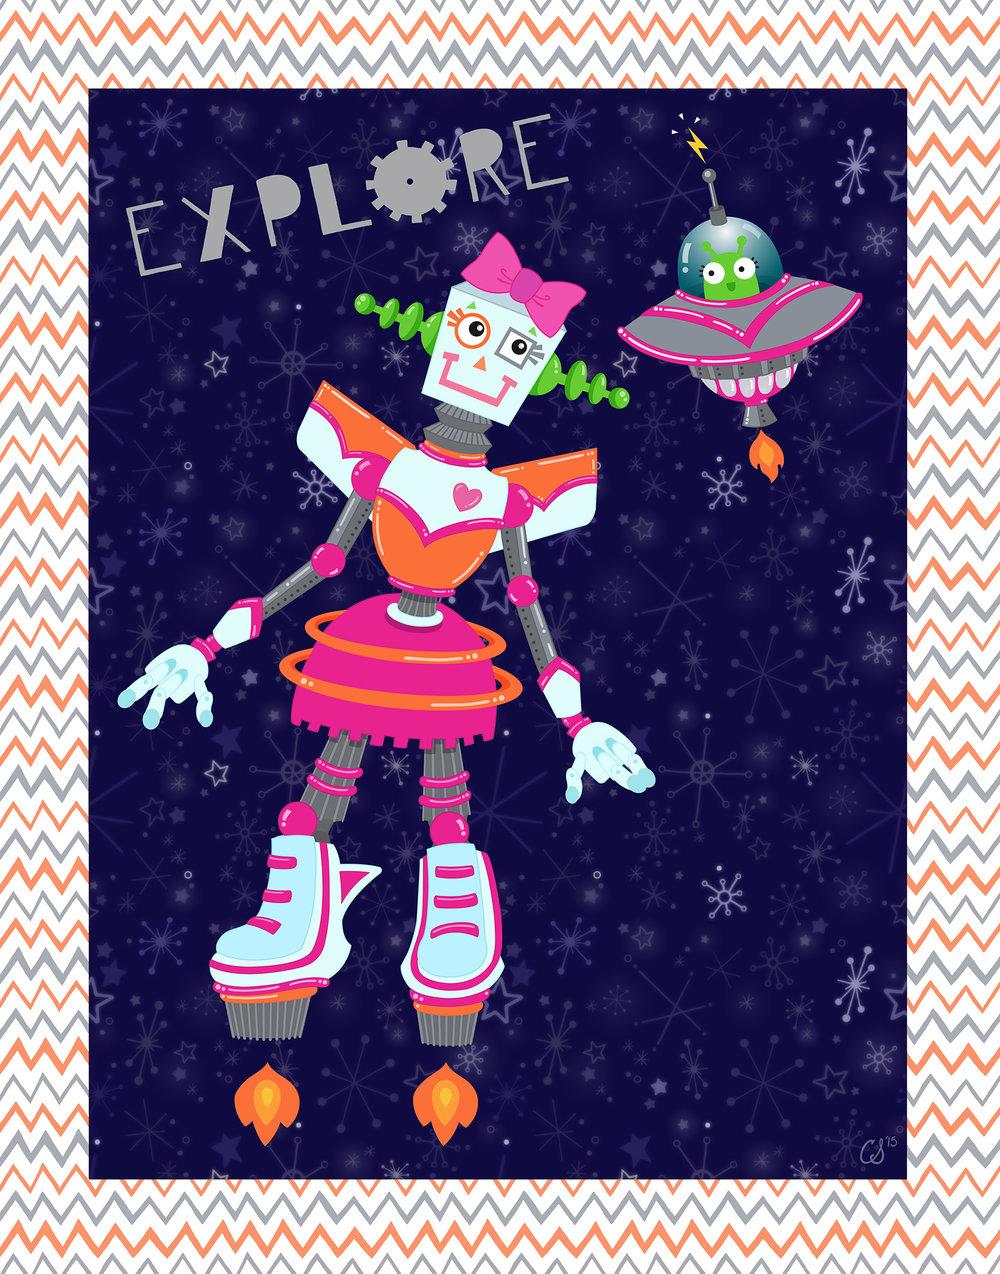 Explore Robot